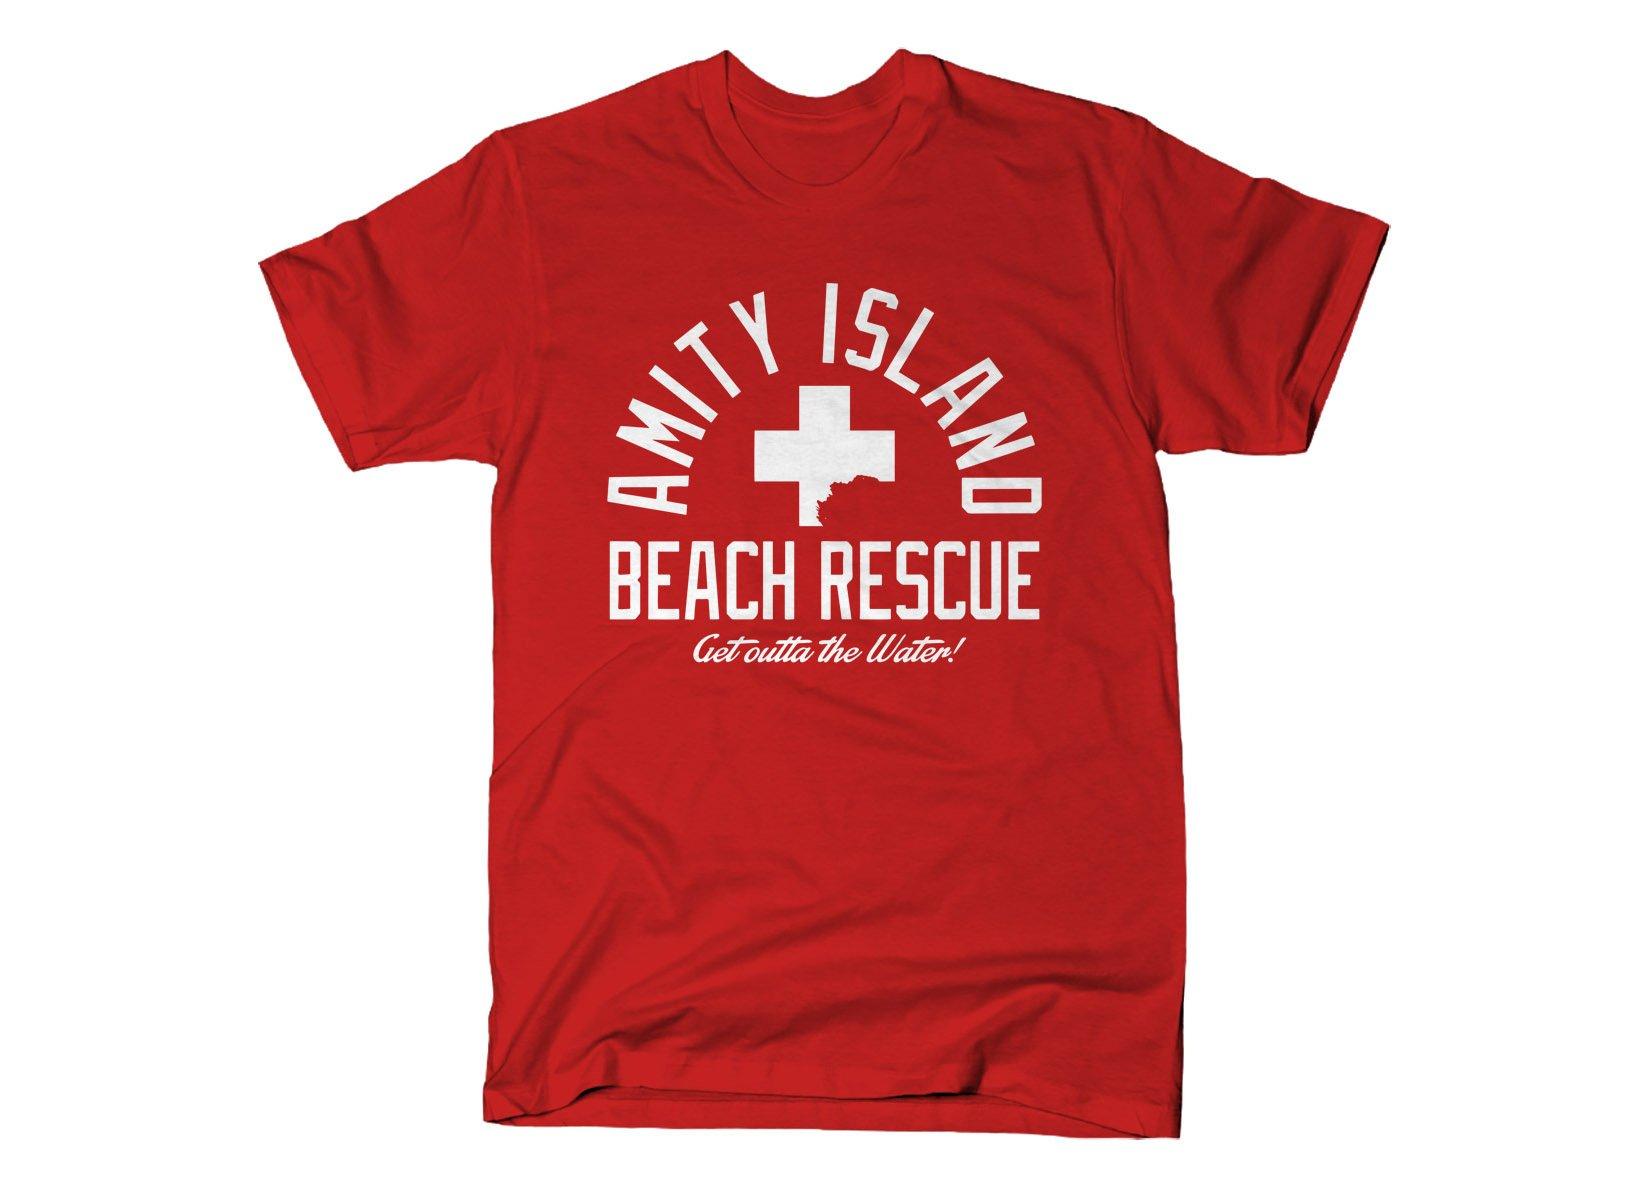 Amity Island Beach Rescue on Mens T-Shirt